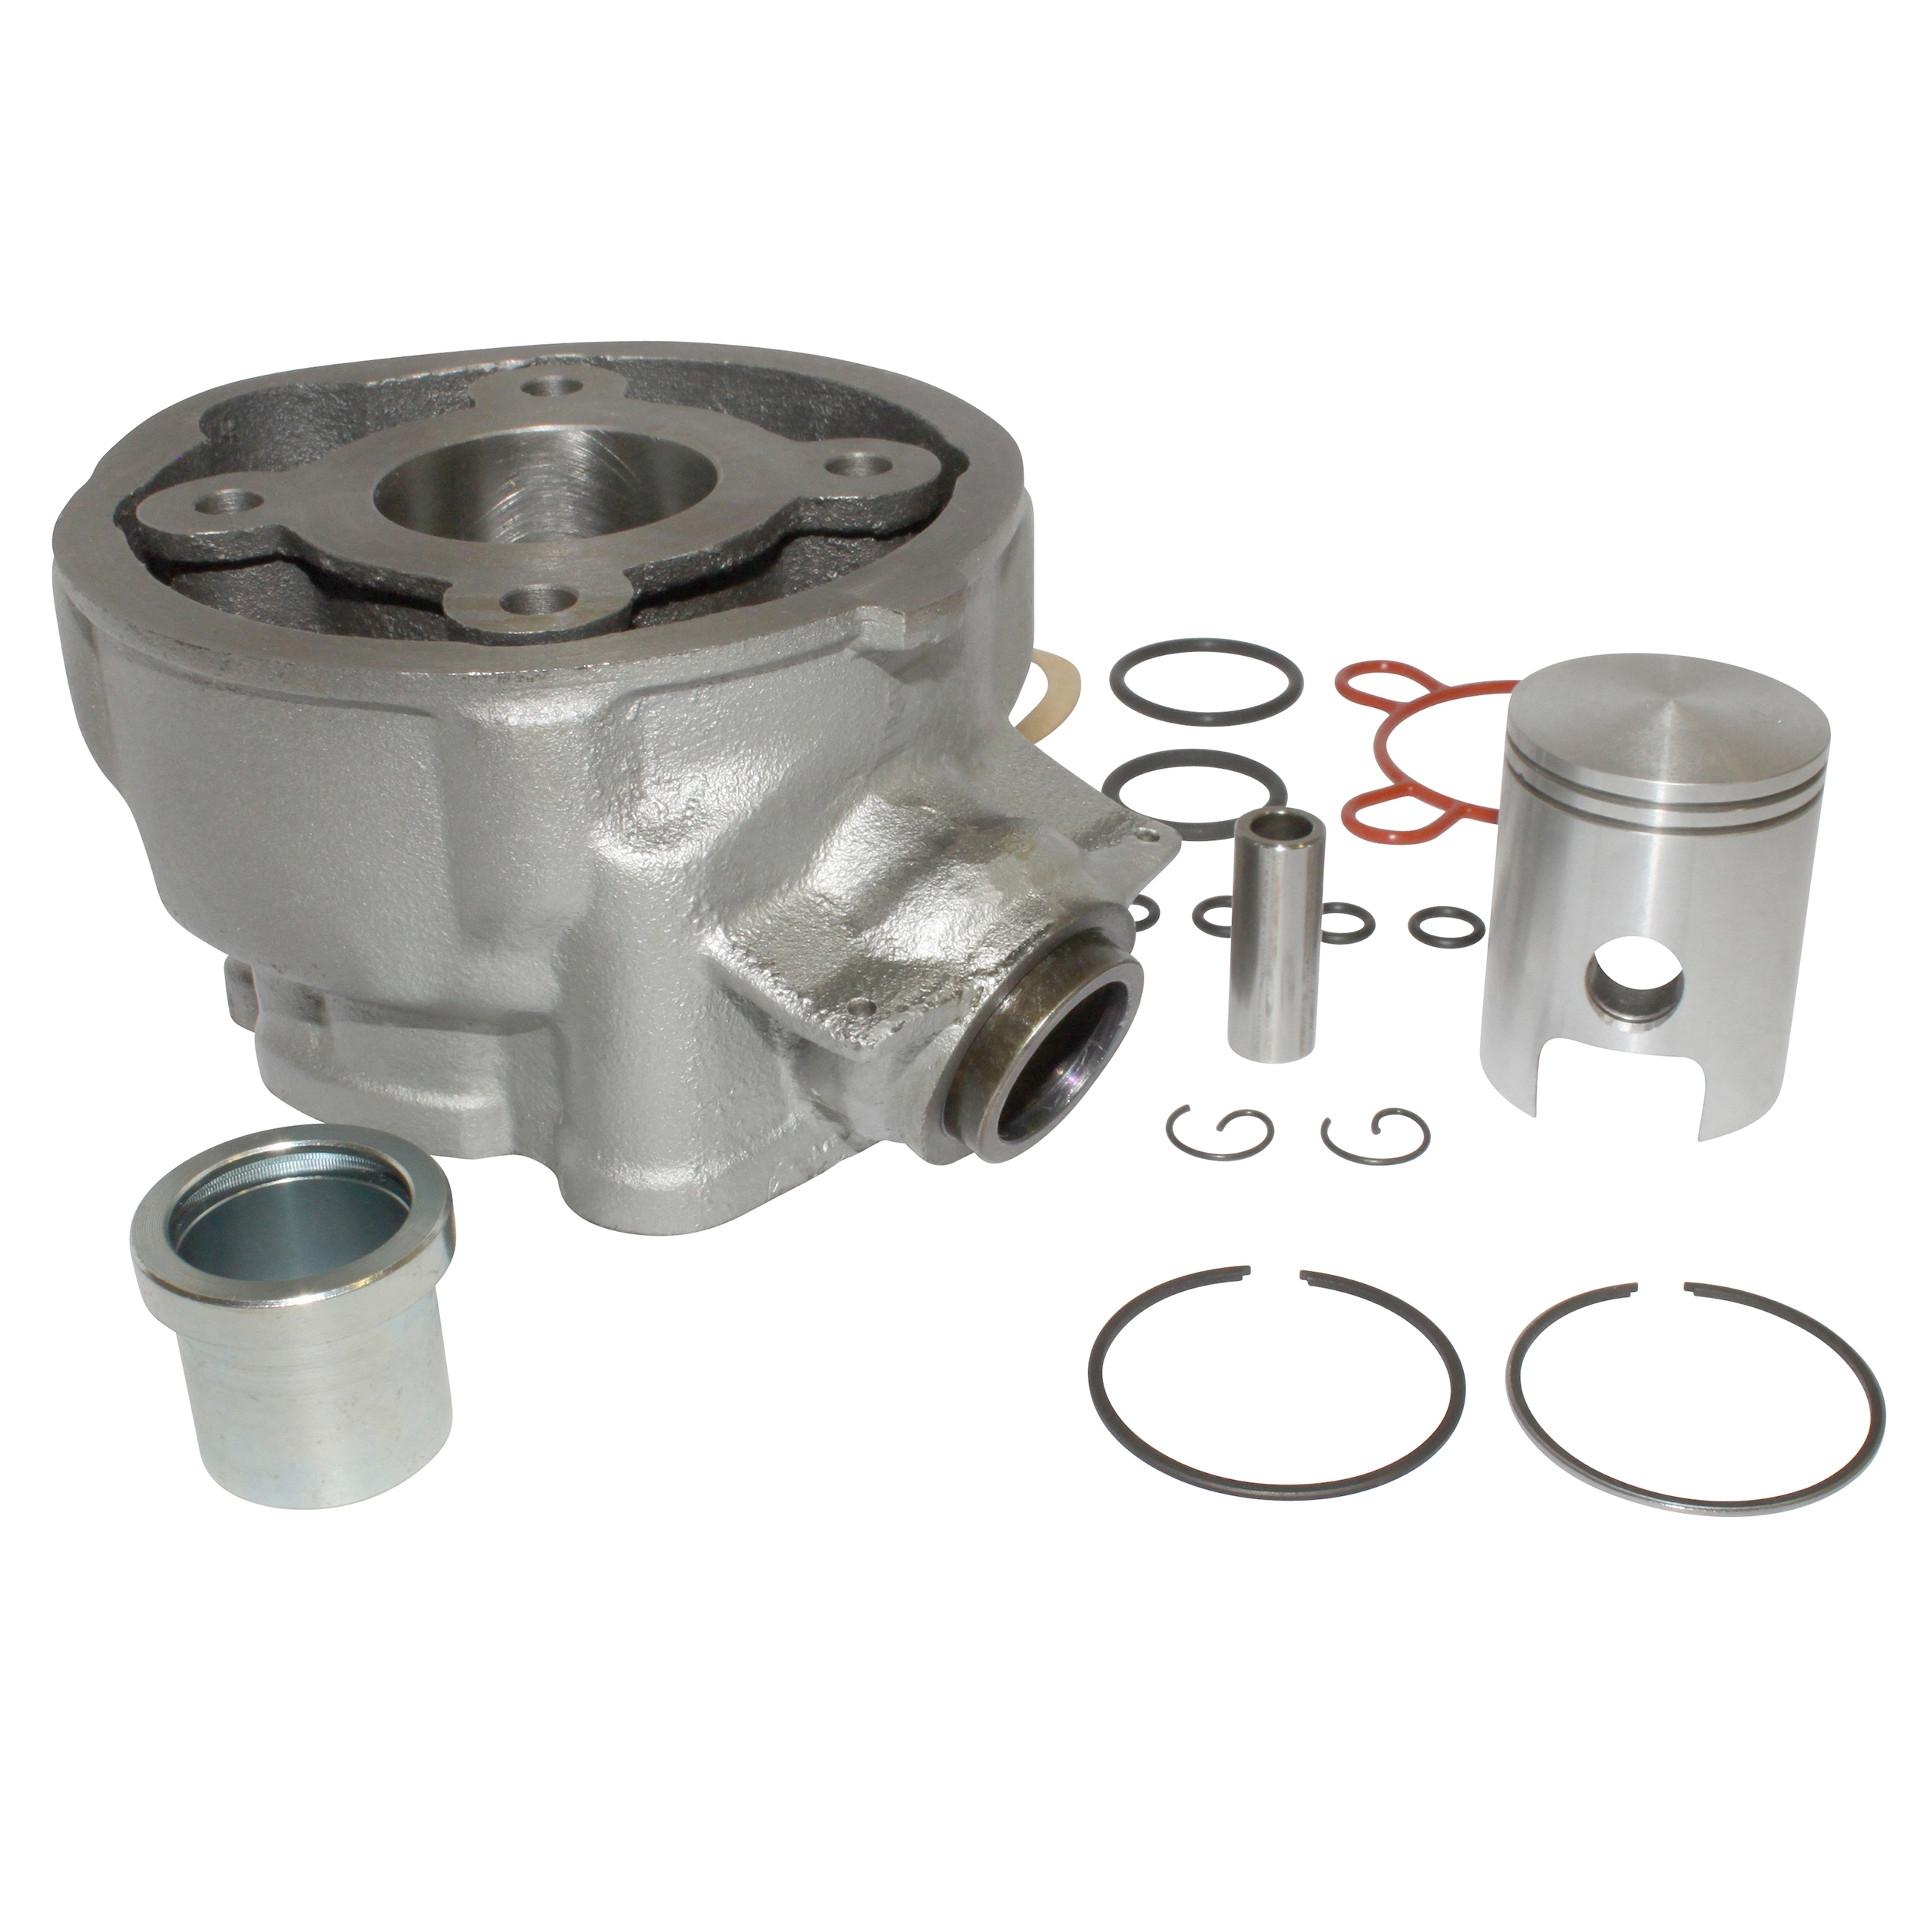 Cylindre 1Tek Origine fonte AM6 2000-